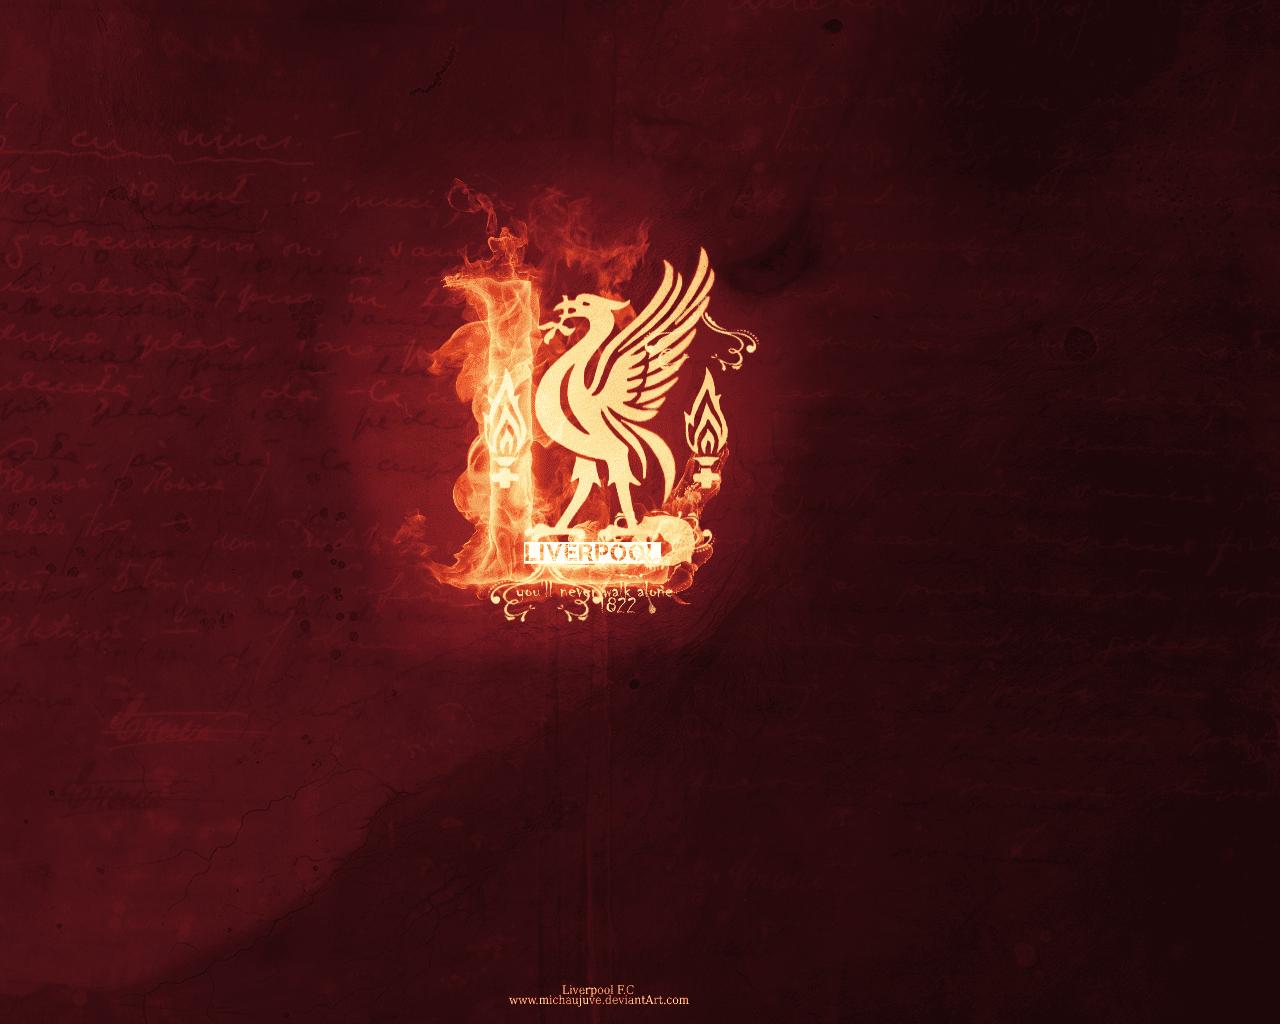 Liverpool Logo Wallpapers - Wallpaper Cave